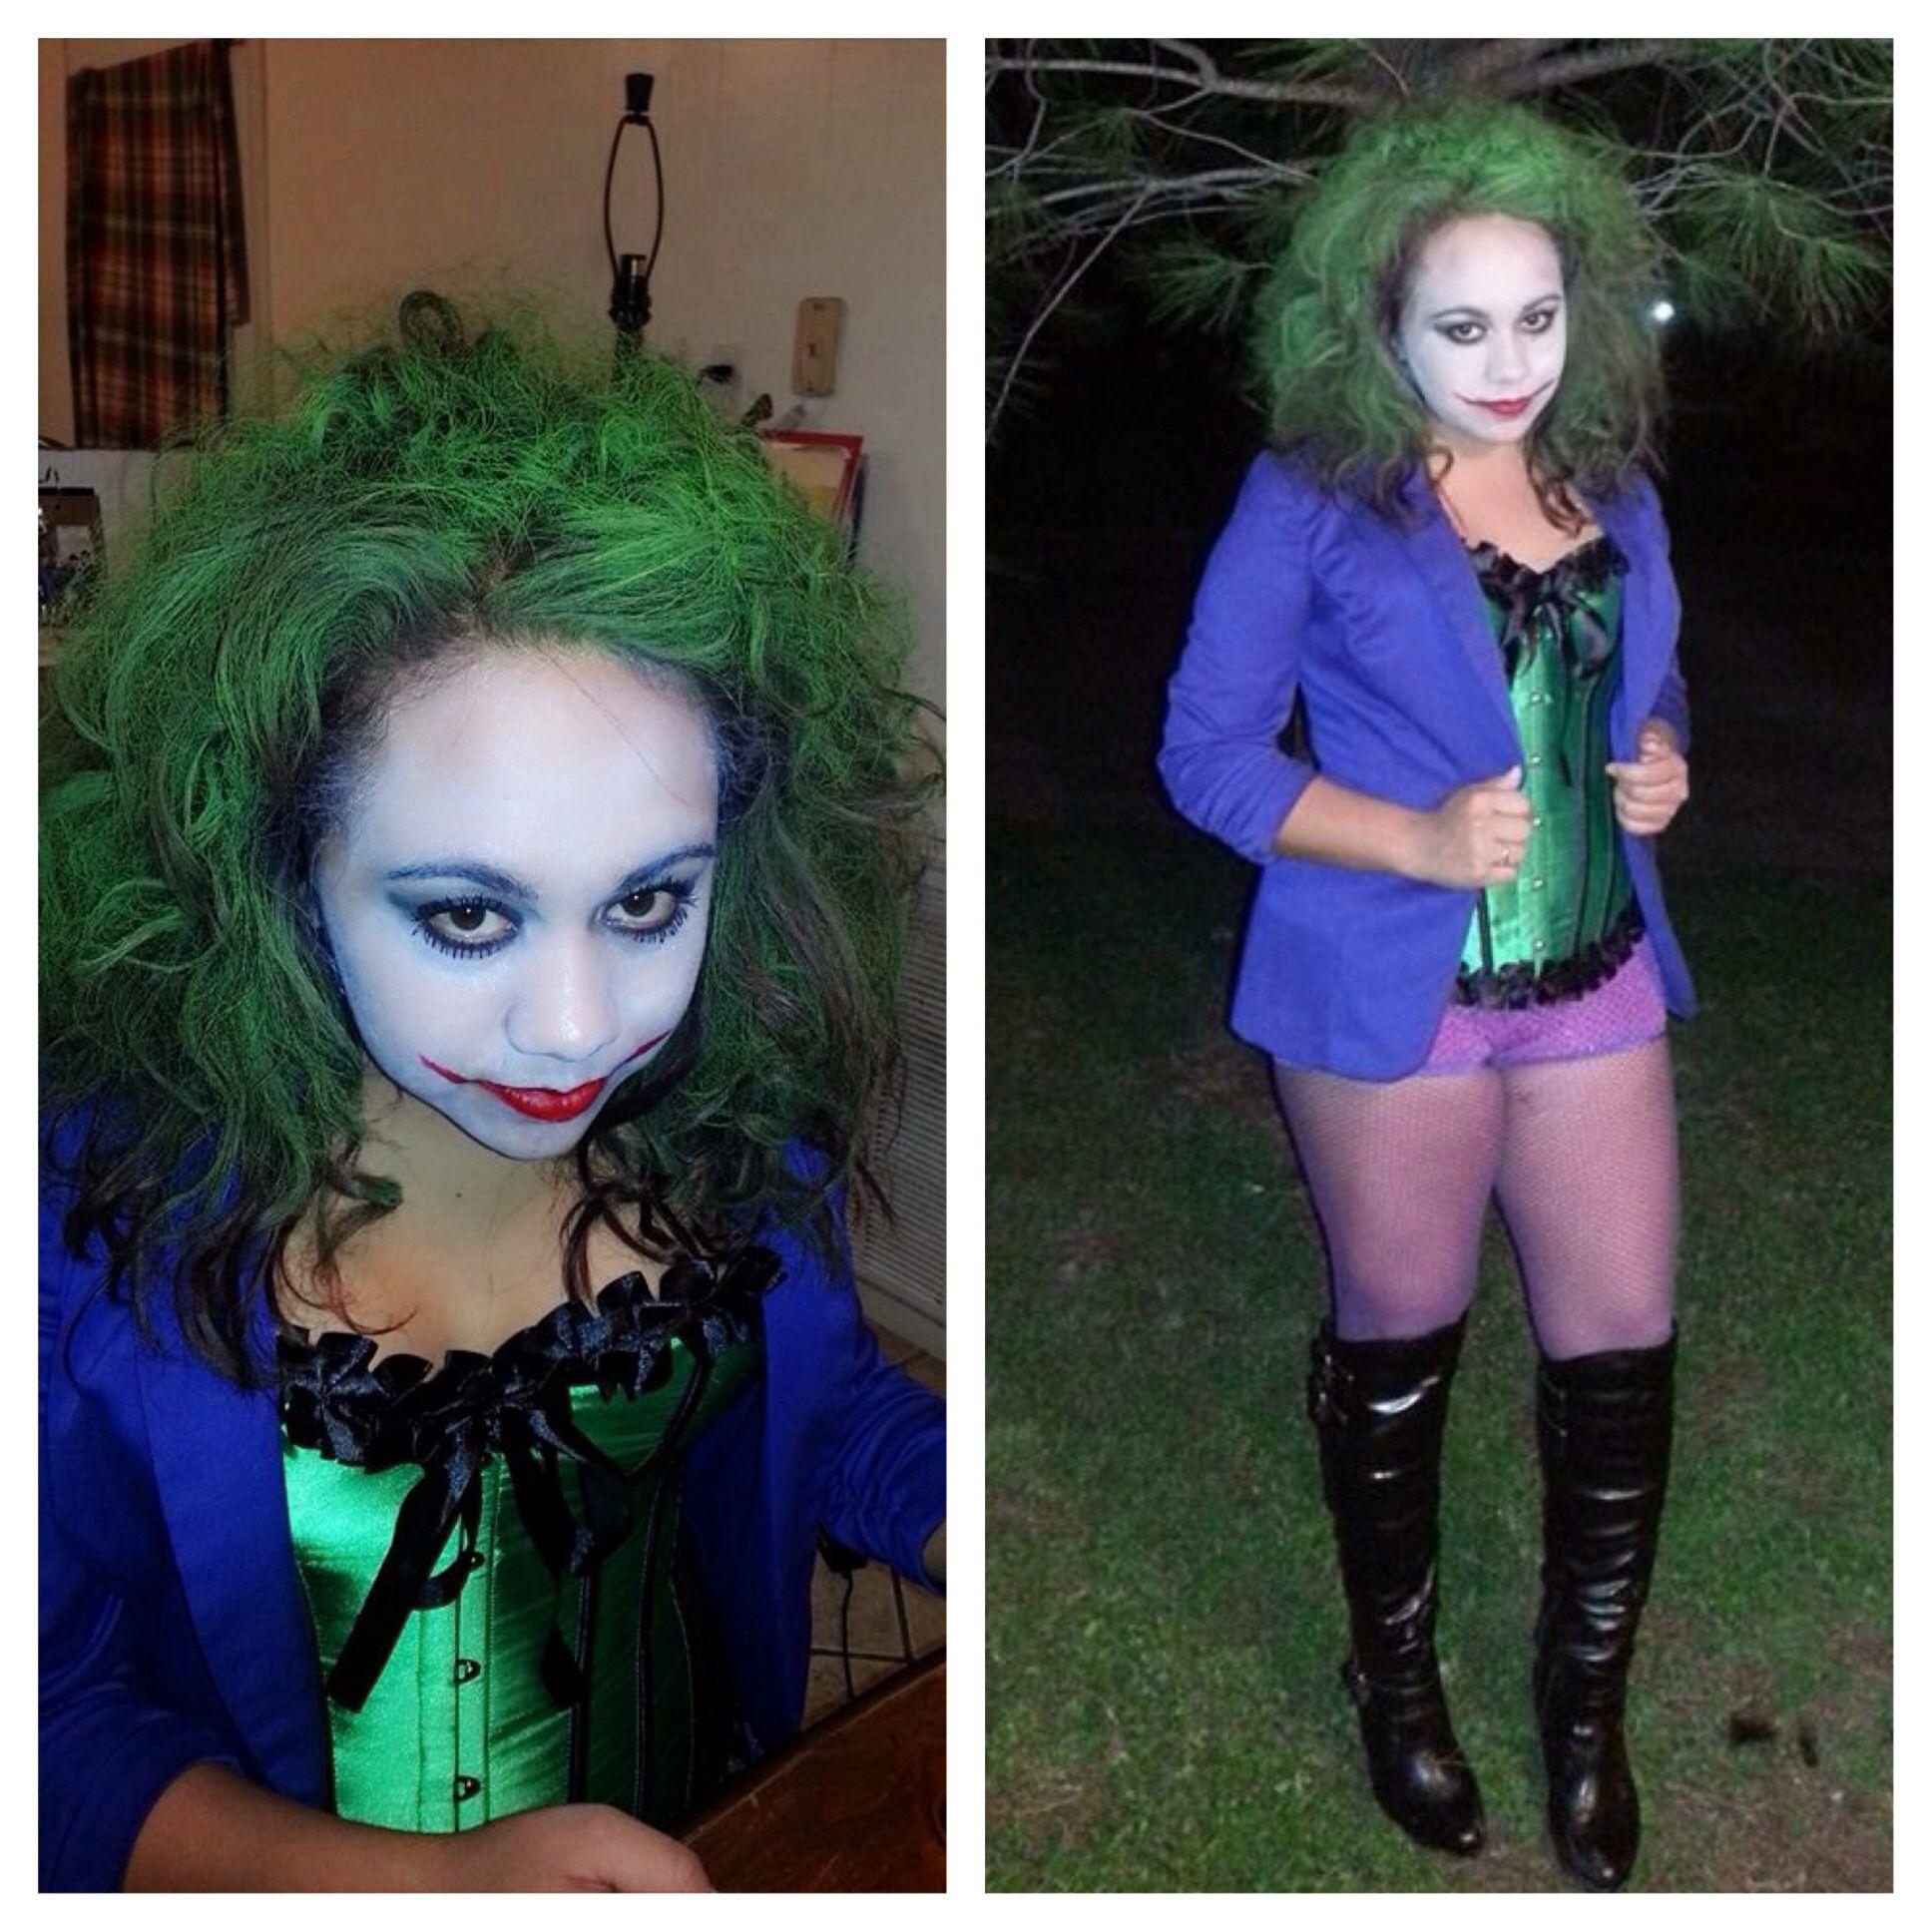 Diy joker costume holiday stuff pinterest diy joker costume diy joker costume solutioingenieria Images